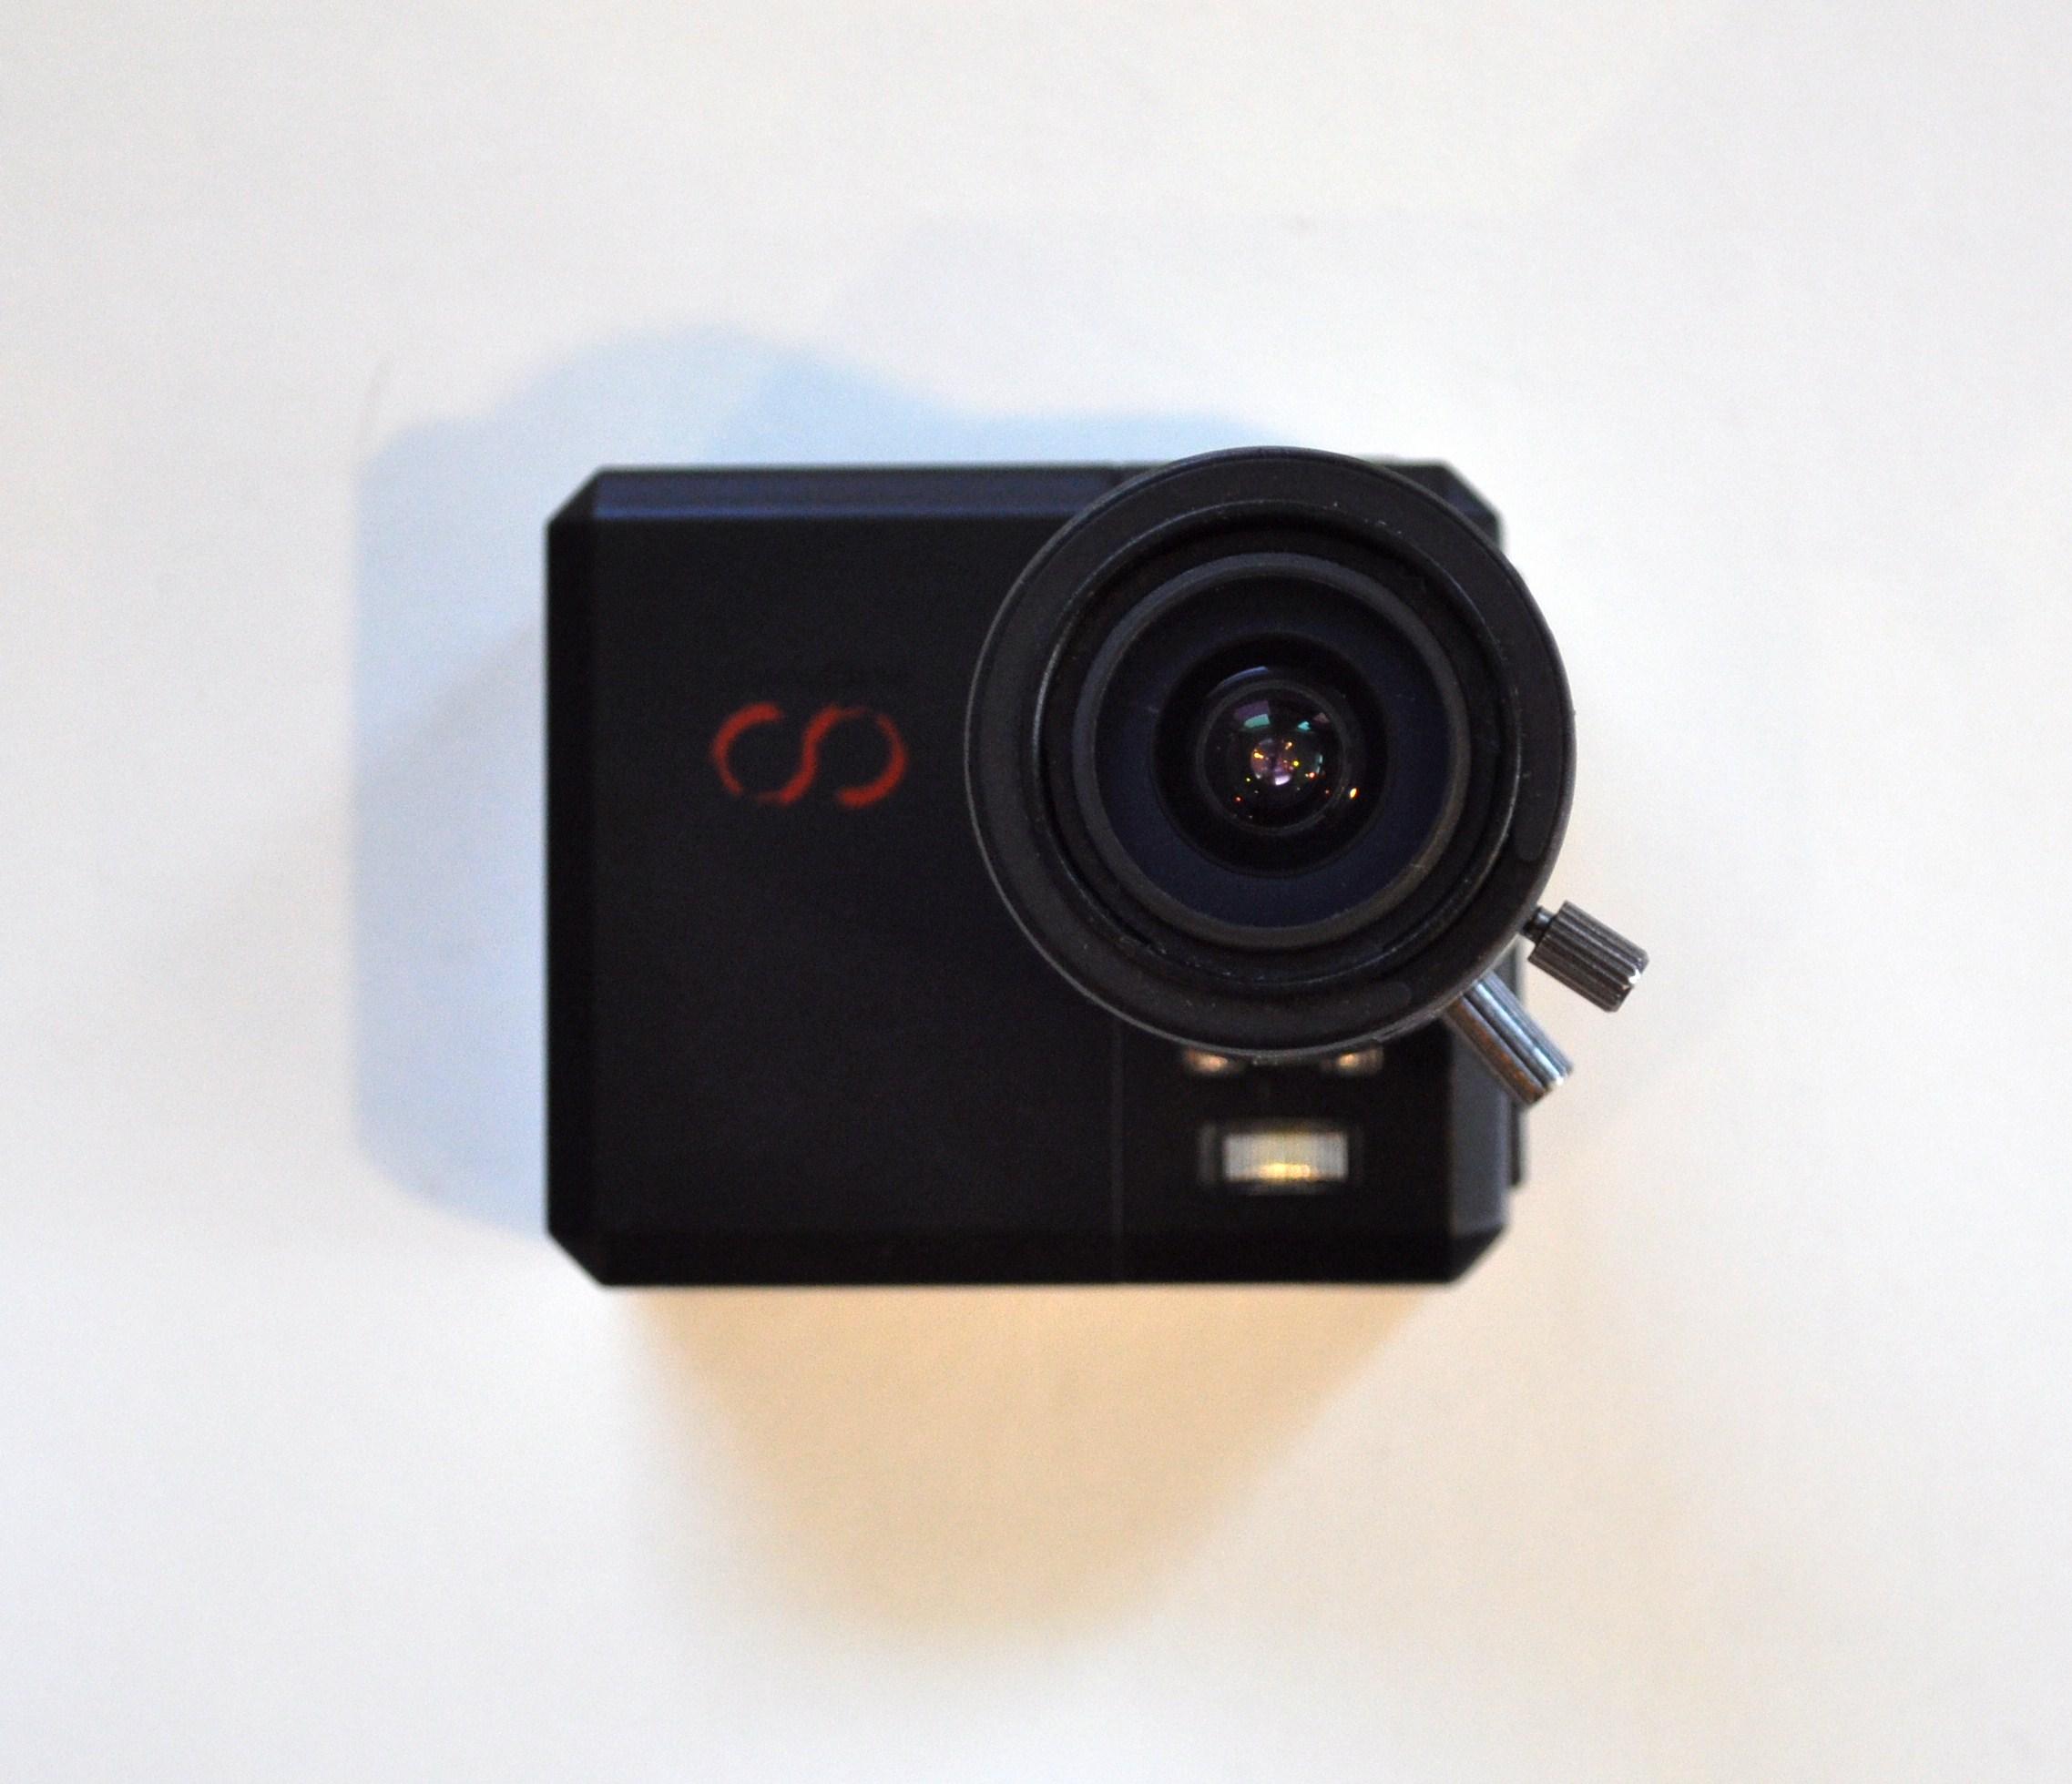 Camone Infinity Hd 2 8mm 12mm Varifocal Megapixel Lens